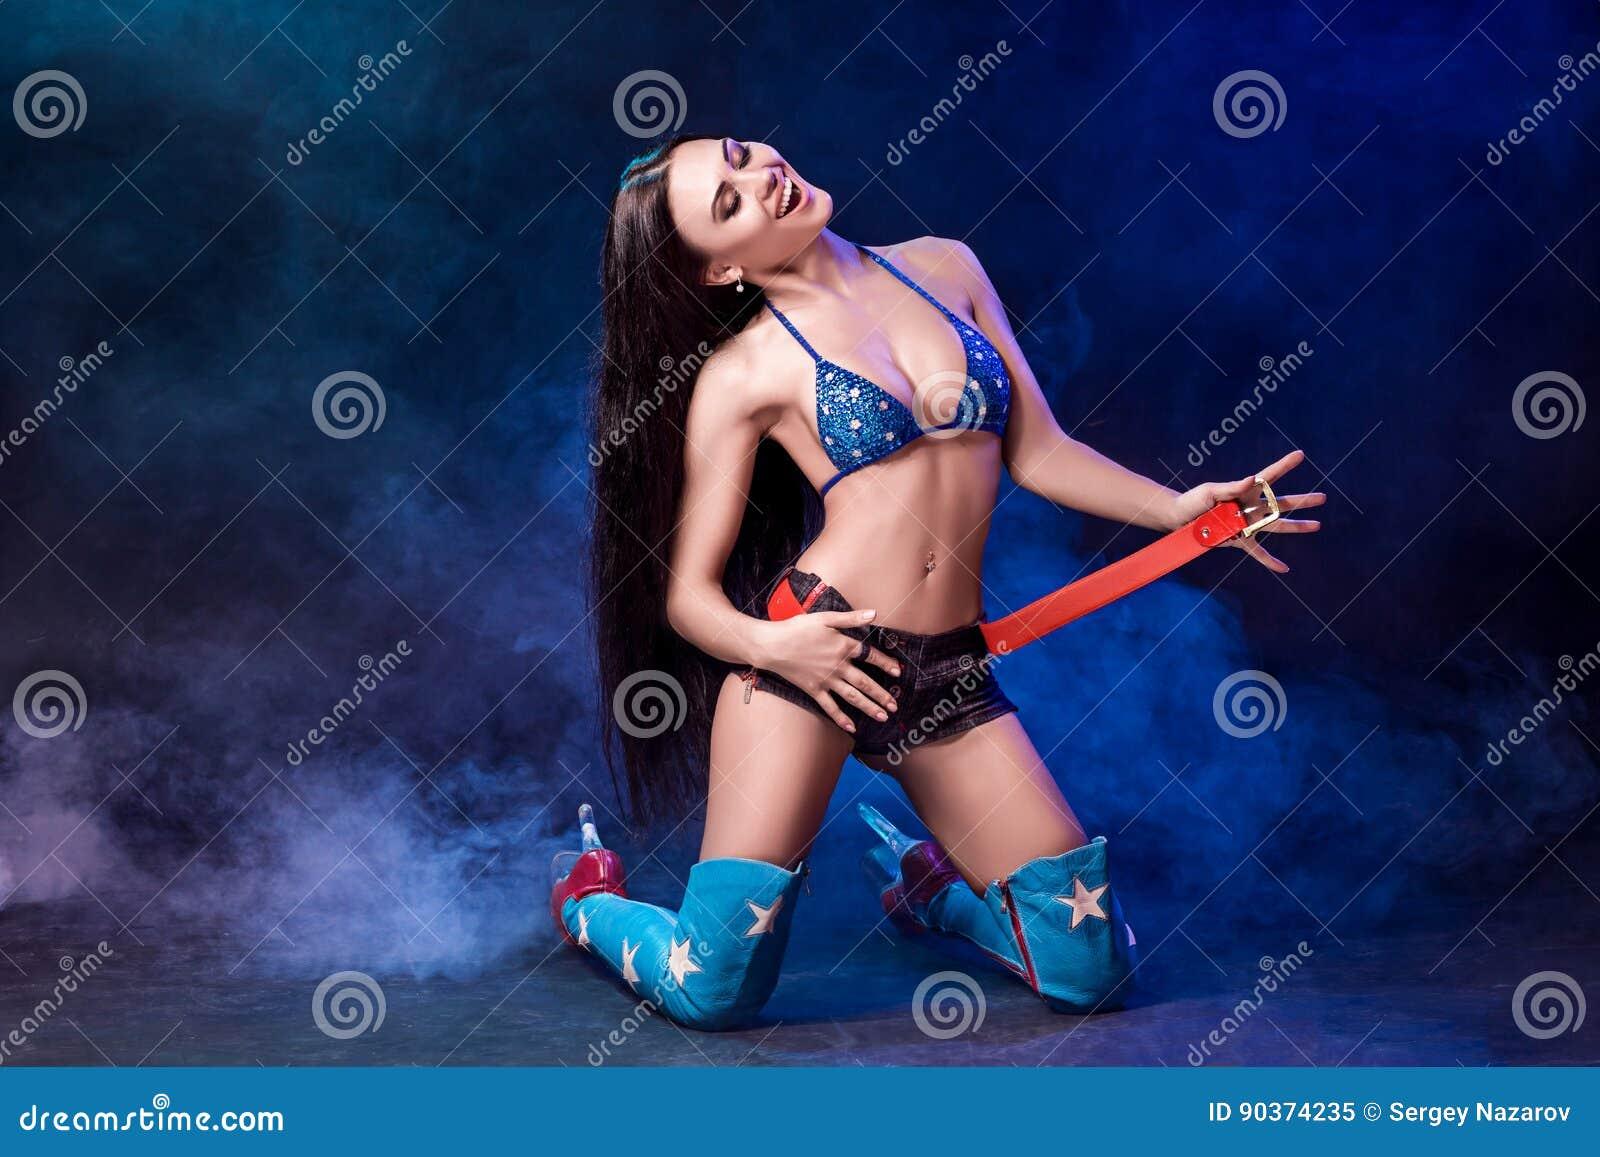 Bikini wrestling hot oil